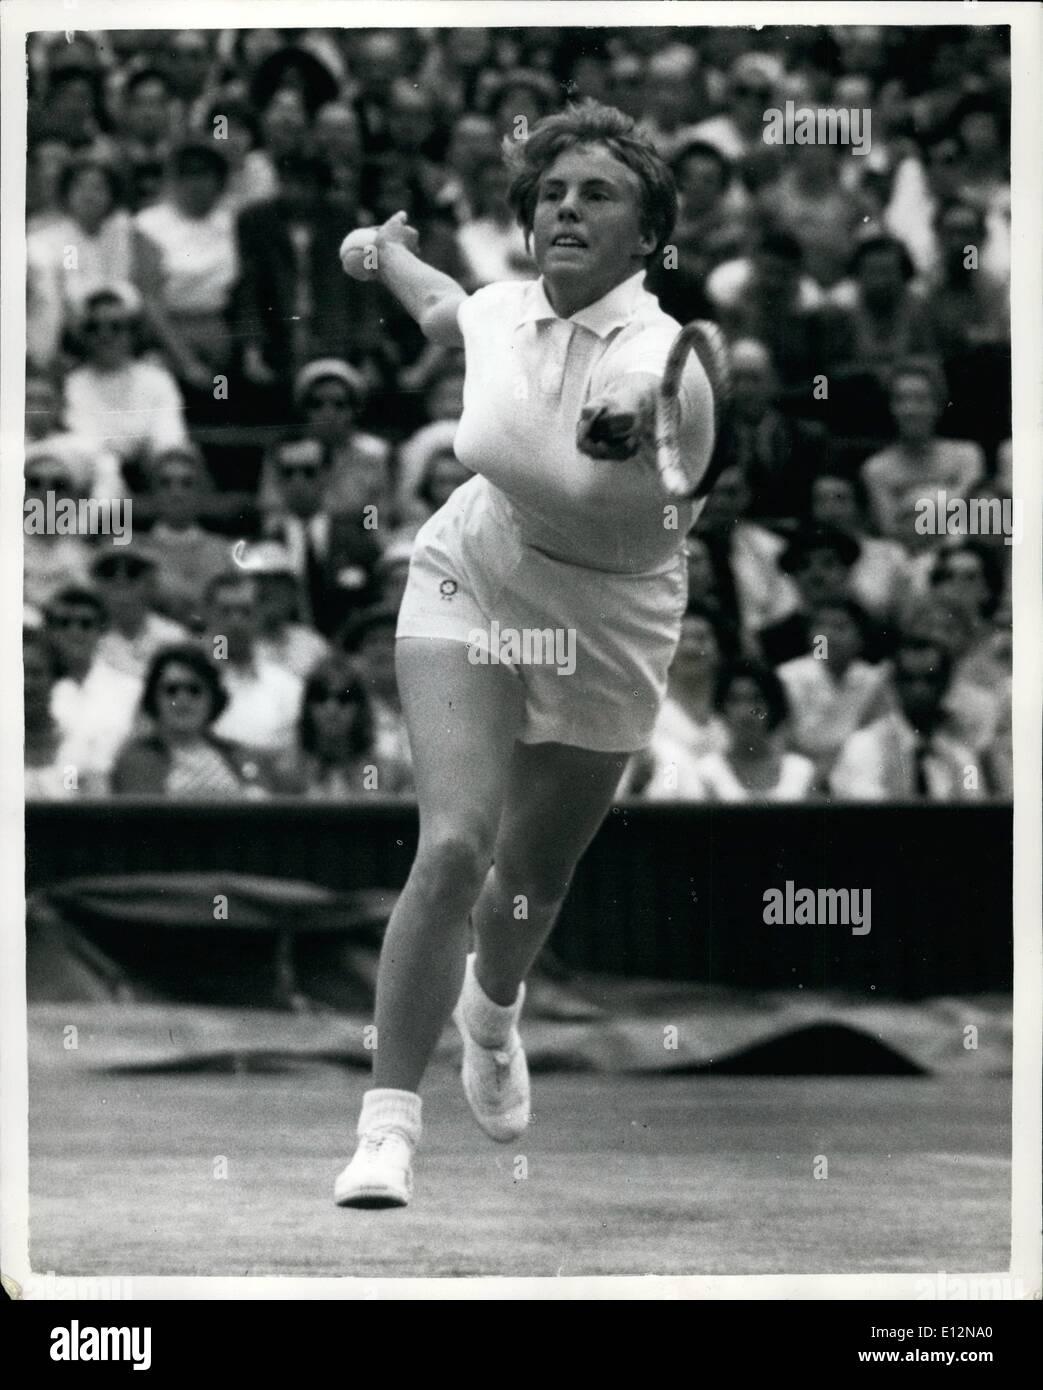 Feb. 24, 2012 - Women's Singles Semi-Final At Wimbledon. Ann Haydon V. Althea Gibson: Photo shows Miss Ann Haydon (G.B.), seen in play against Miss Althea Gibson (U.S.A.), during their ladies singles semi-final match at Wimbledon today. - Stock Image